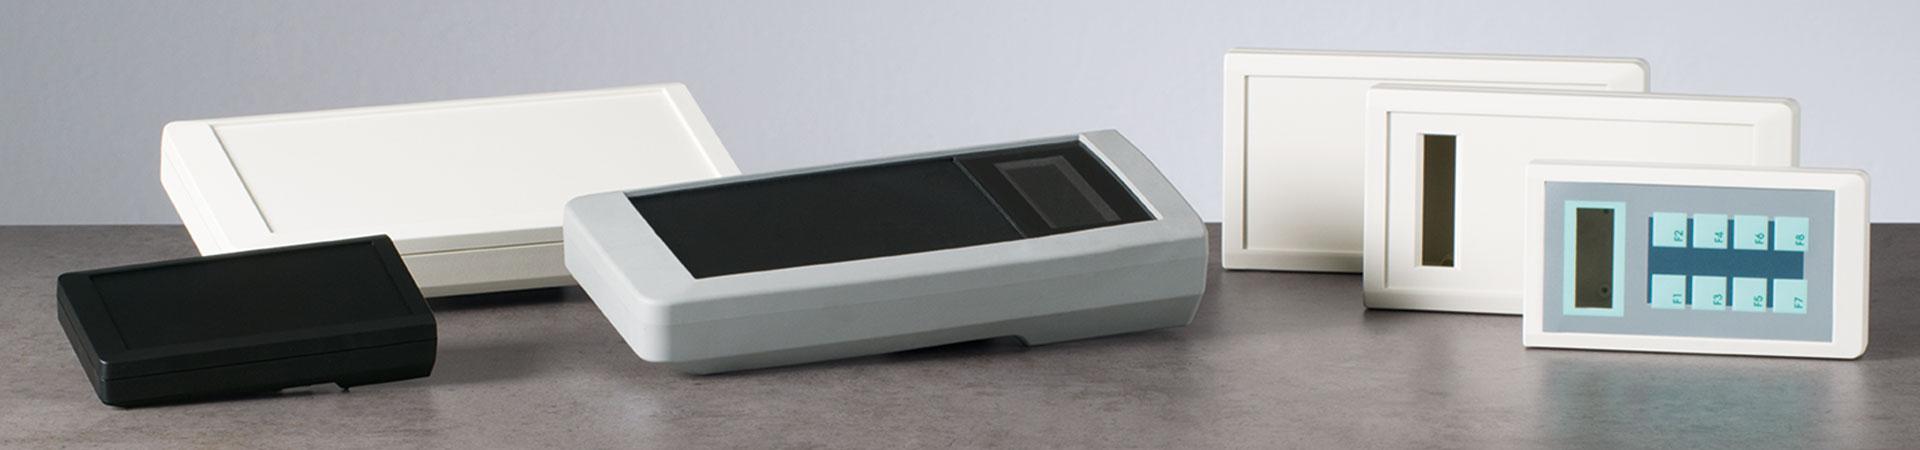 DATEC-MOBIL-BOX